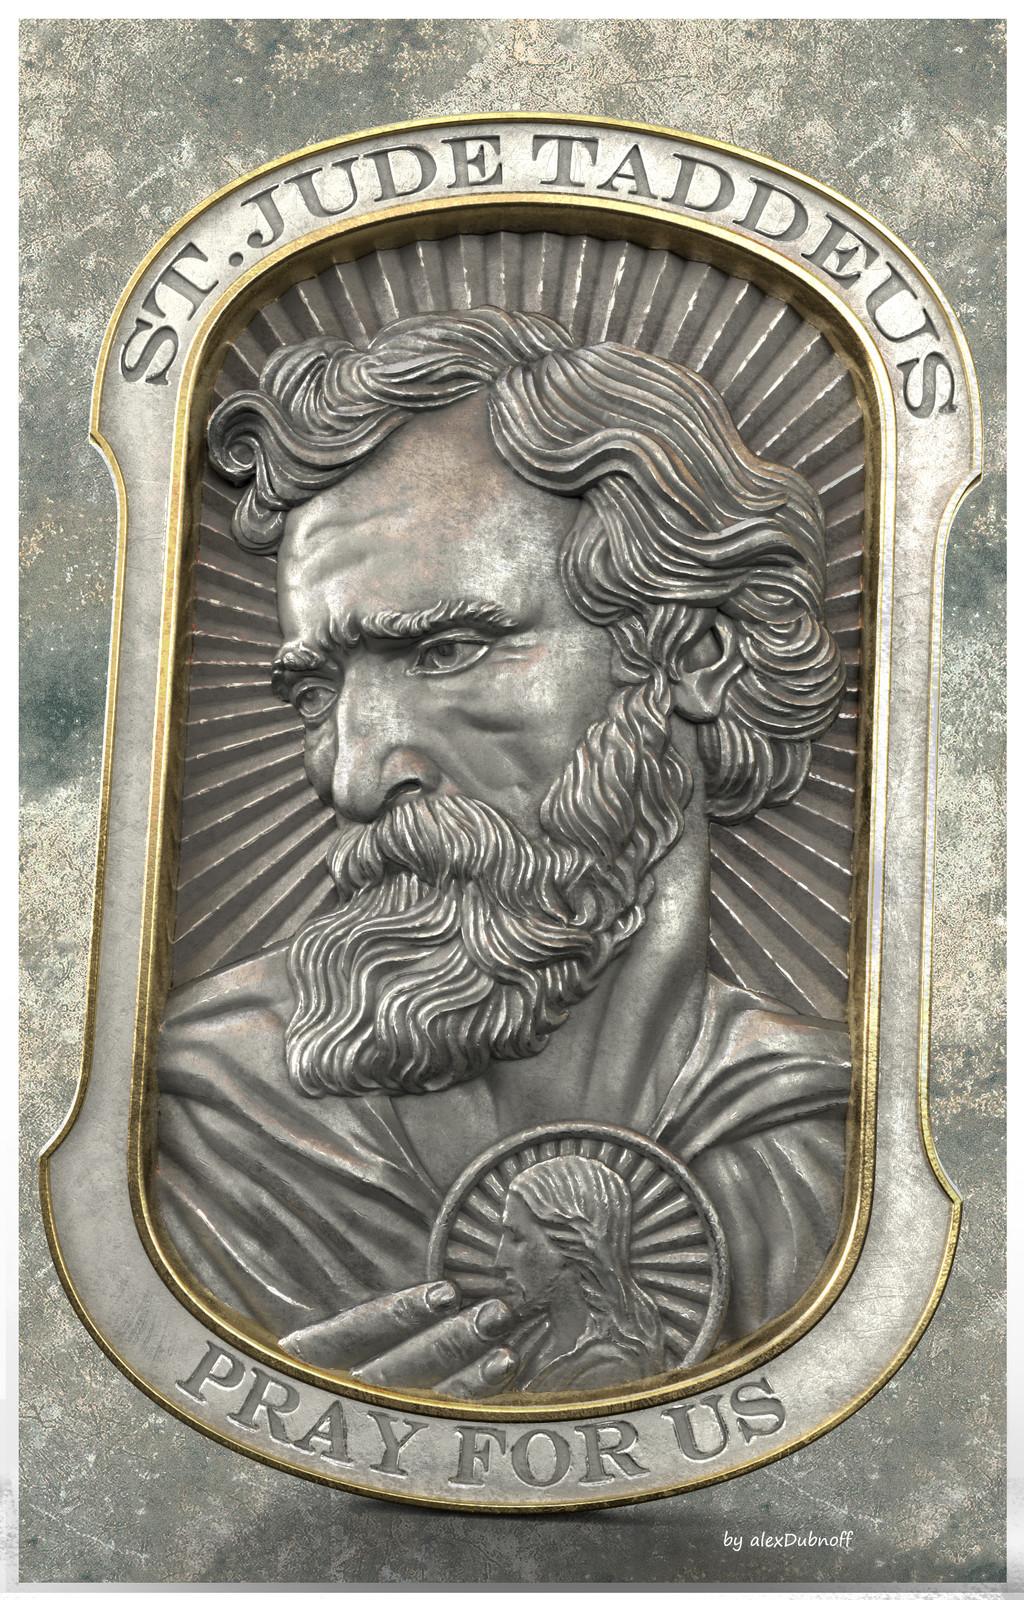 St Jude Taddeus pendant